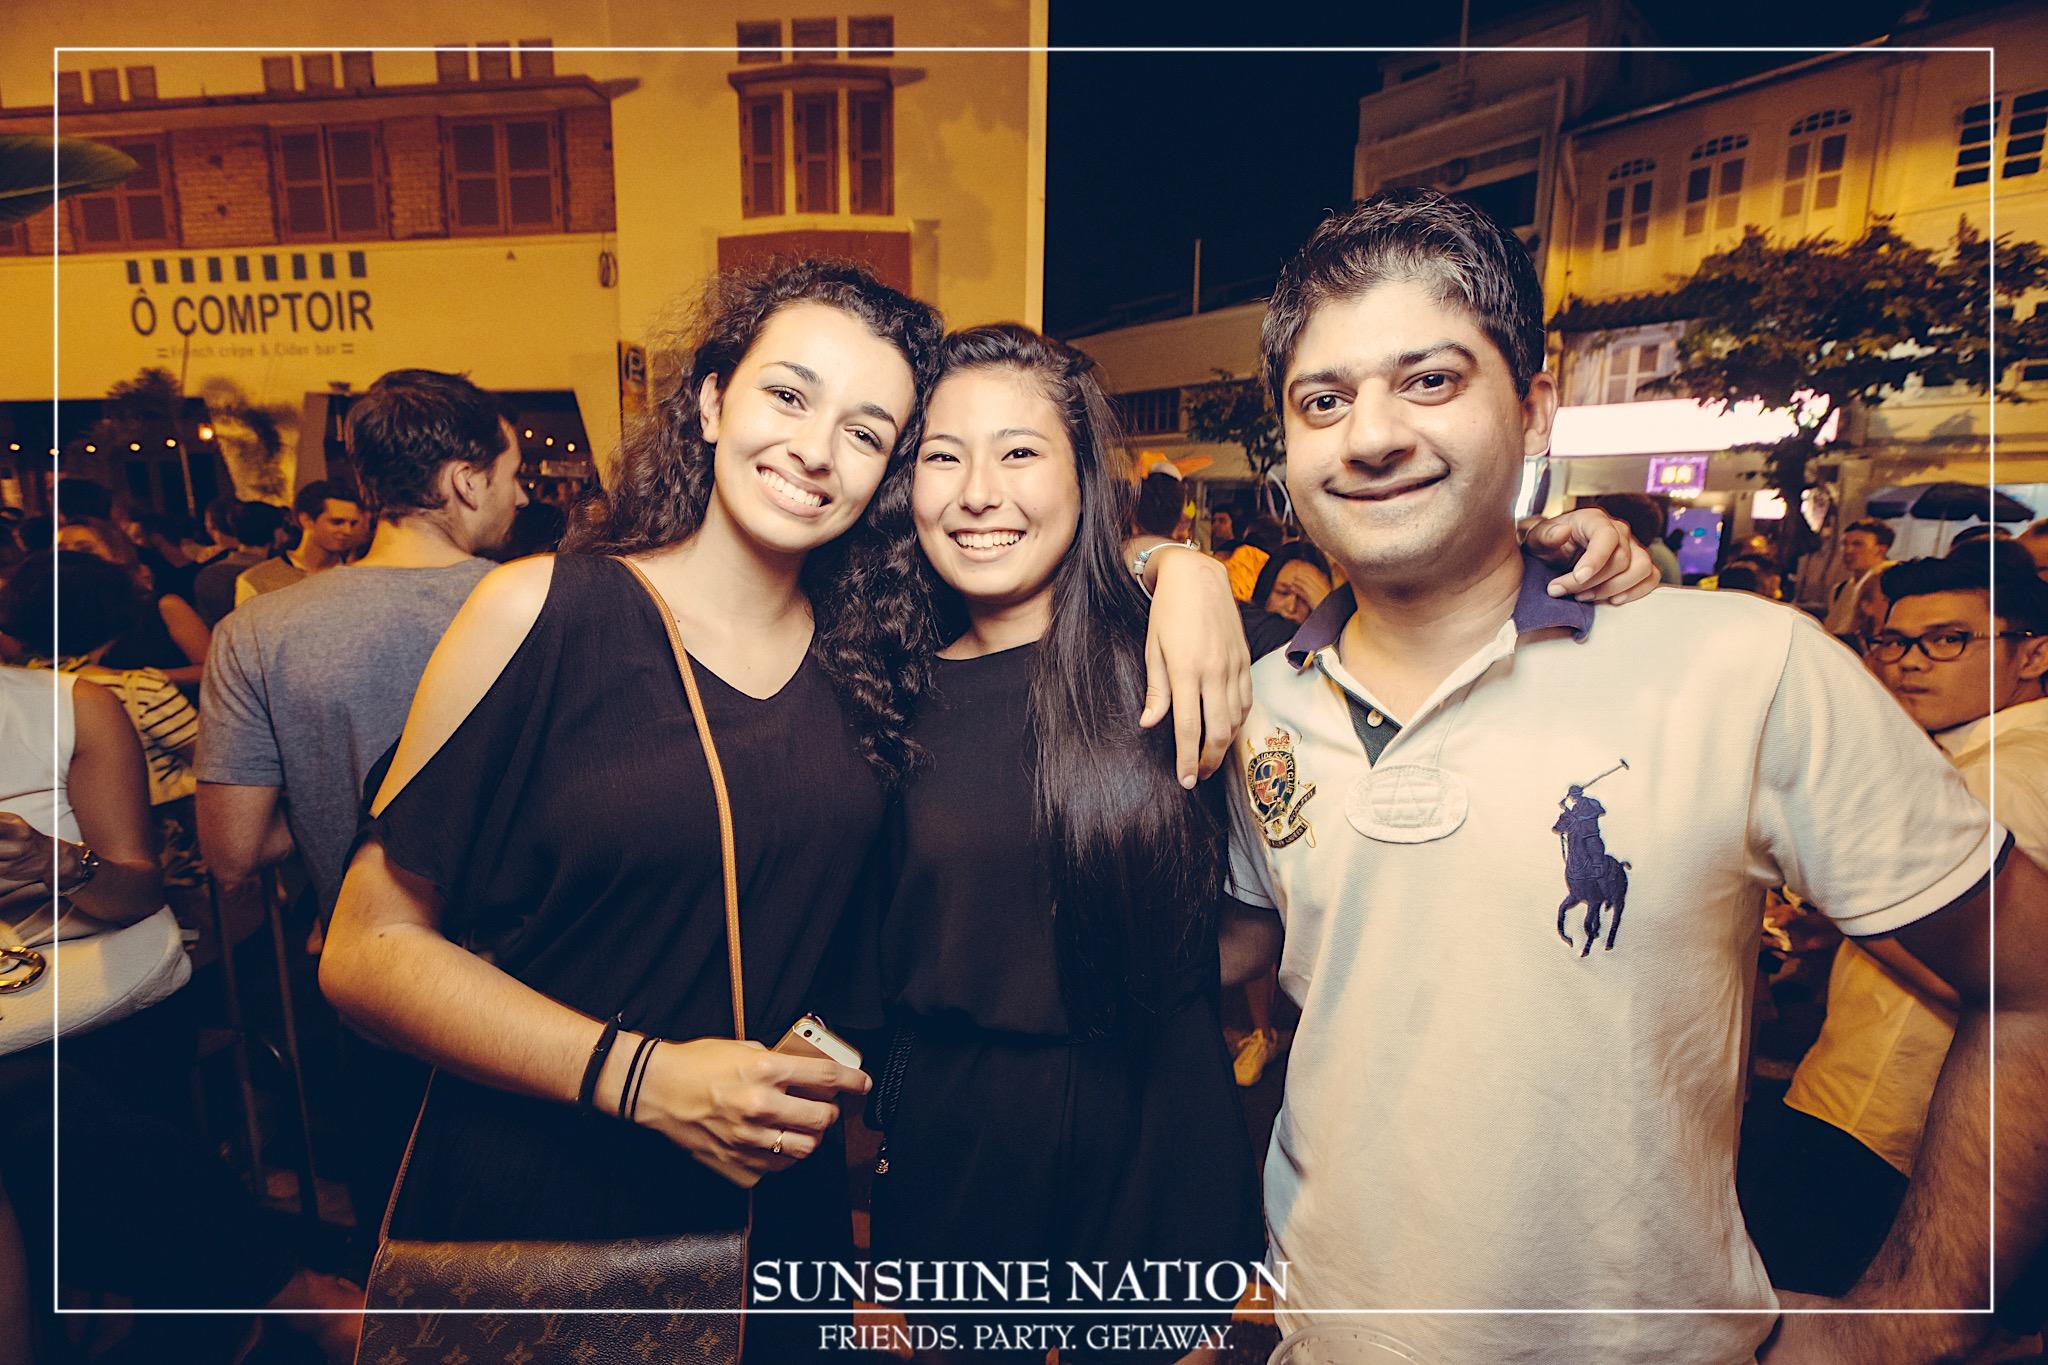 16092016_SunshineNation_Colossal017_Watermarked.jpg